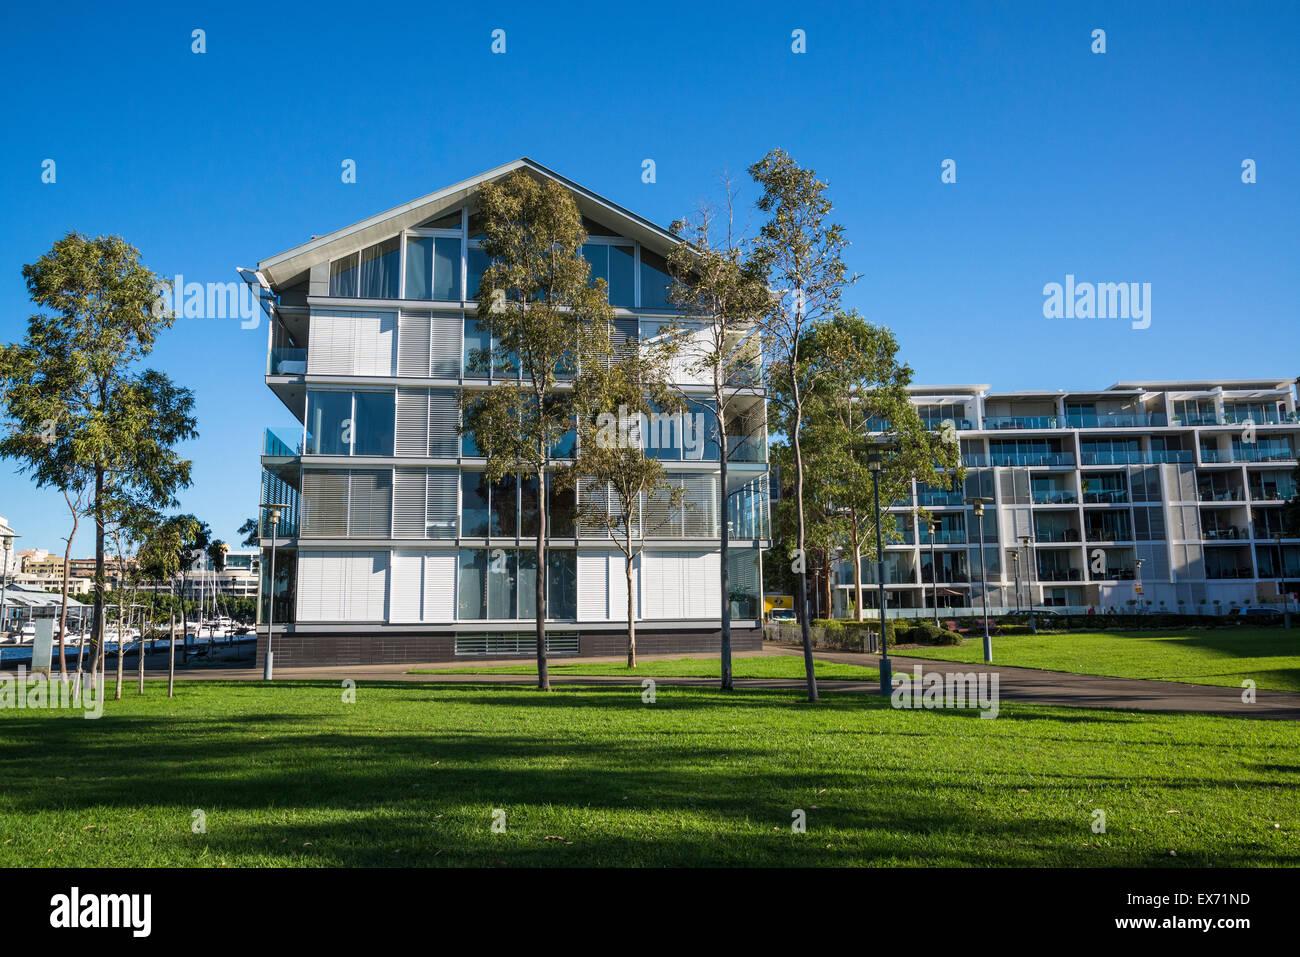 Darling Island luxury housing development, Sydney, Australia - Stock Image